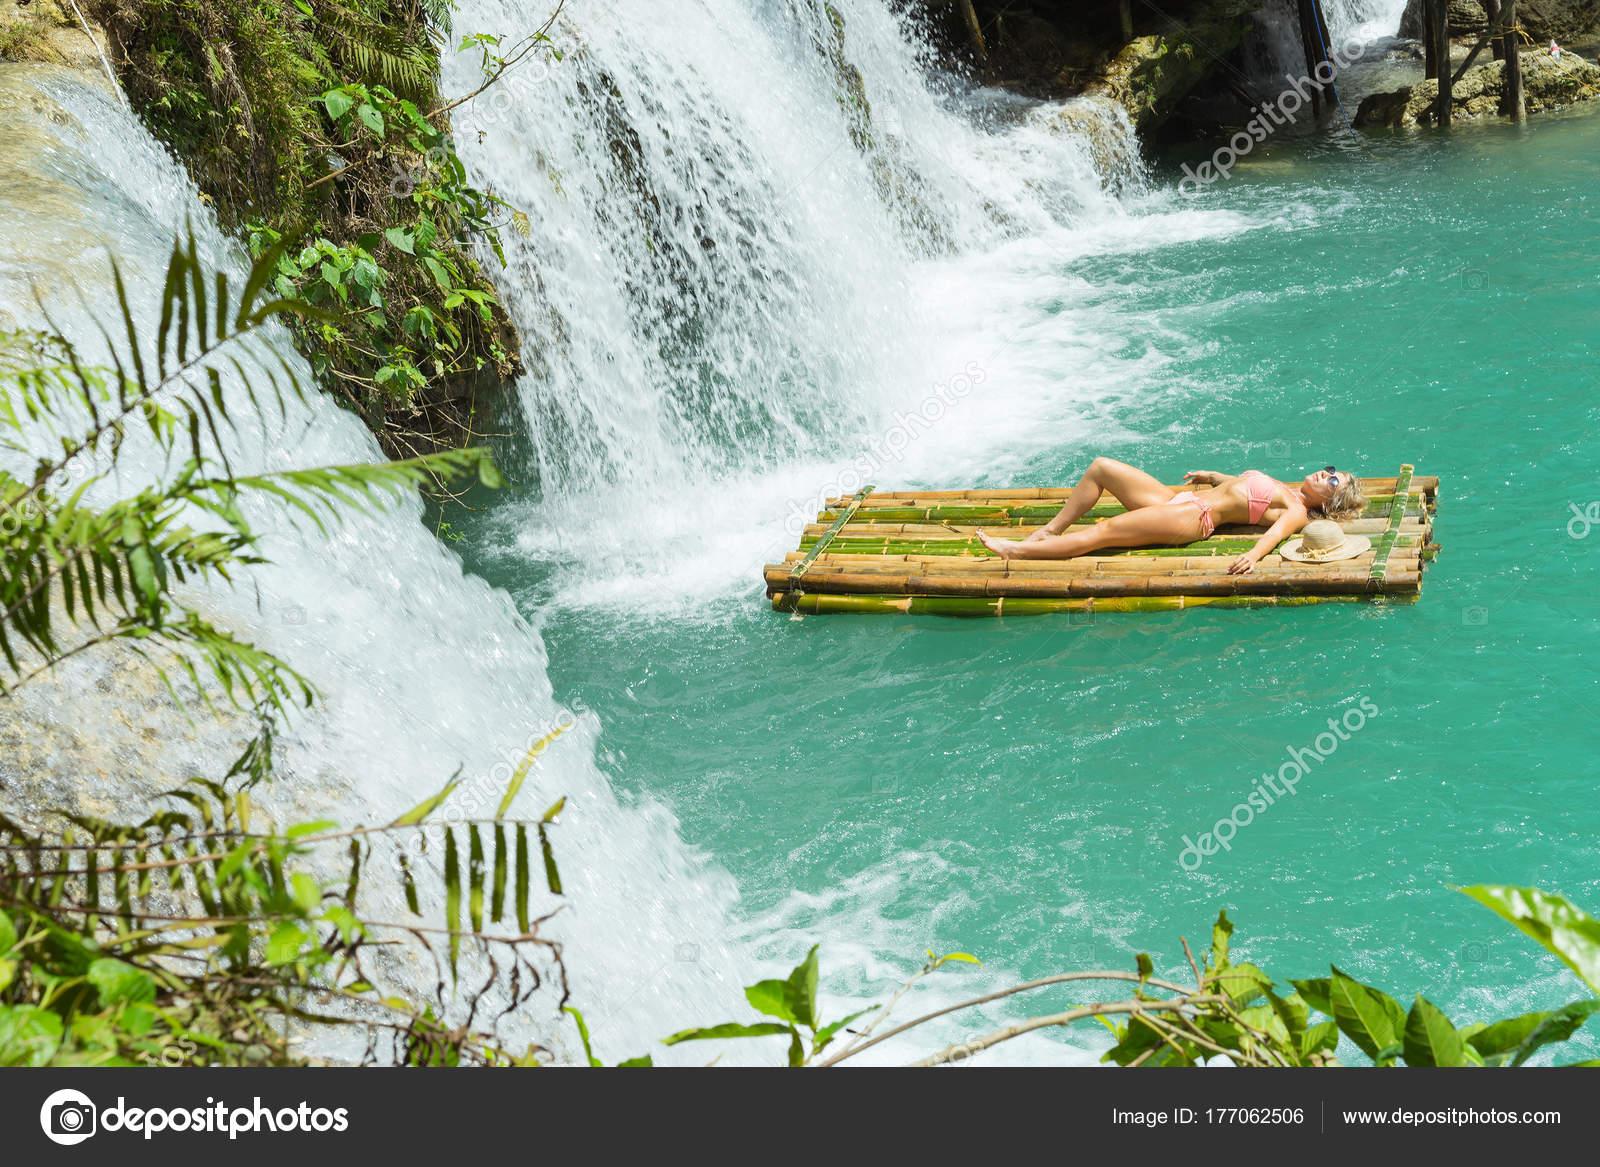 Frau Bikini Auf Bambus Floss Der Nahe Wasserfall Entspannen